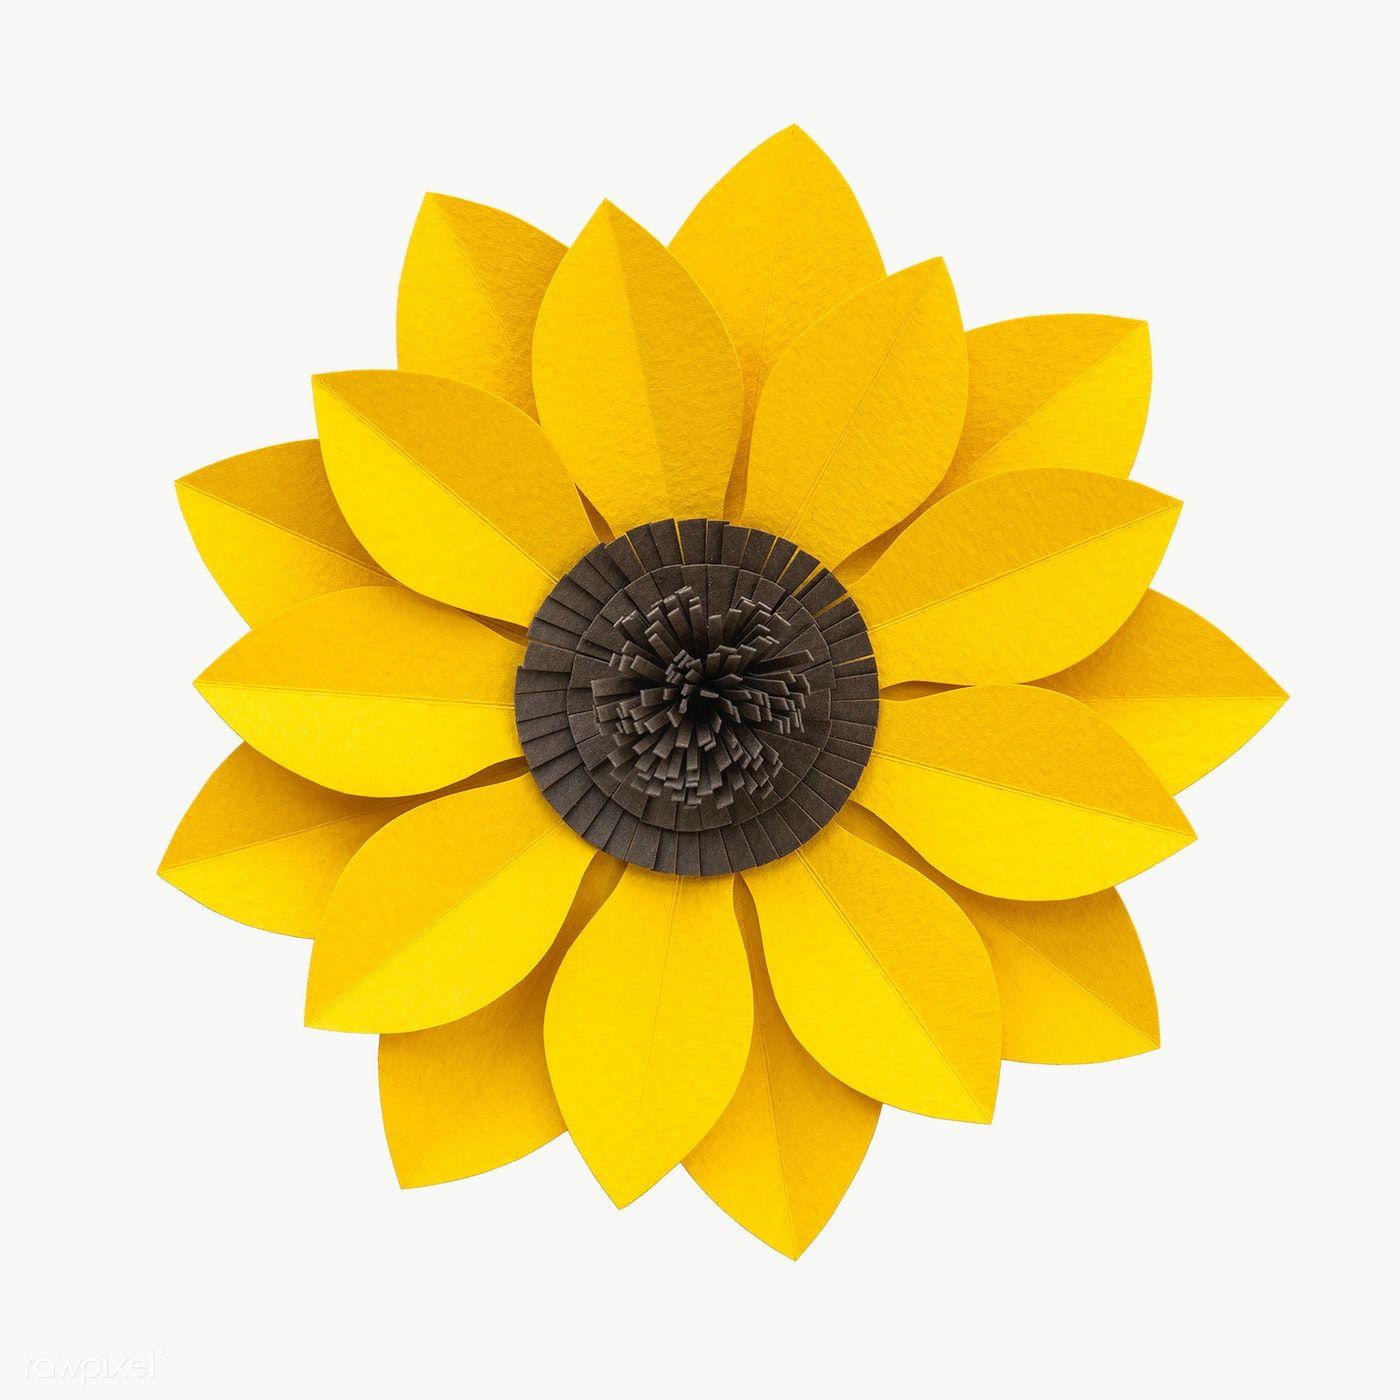 Download Premium Png Of Sunflower Paper Craft Transparent Png 2025450 In 2020 Sunflower Paper Craft Sunflower Crafts Paper Crafts